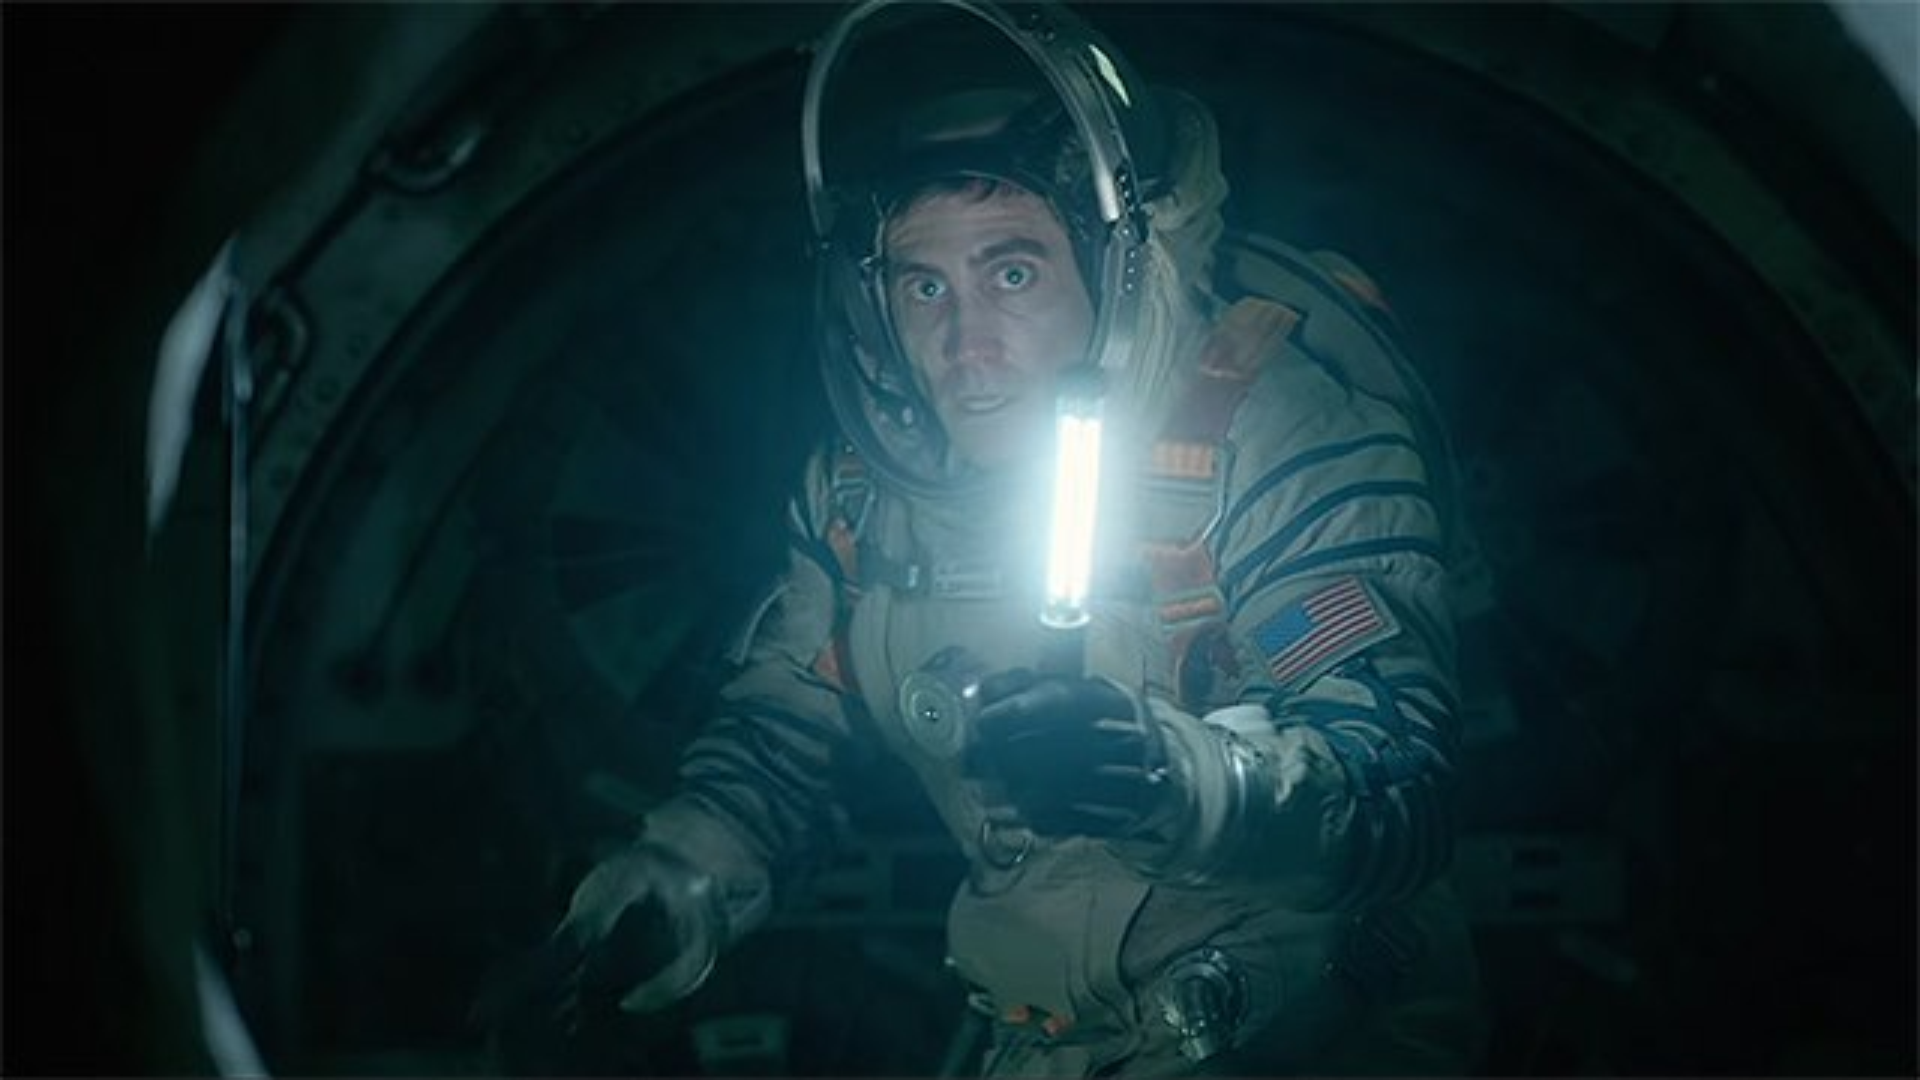 Jake-Gyllenhaal-Life-Trailer